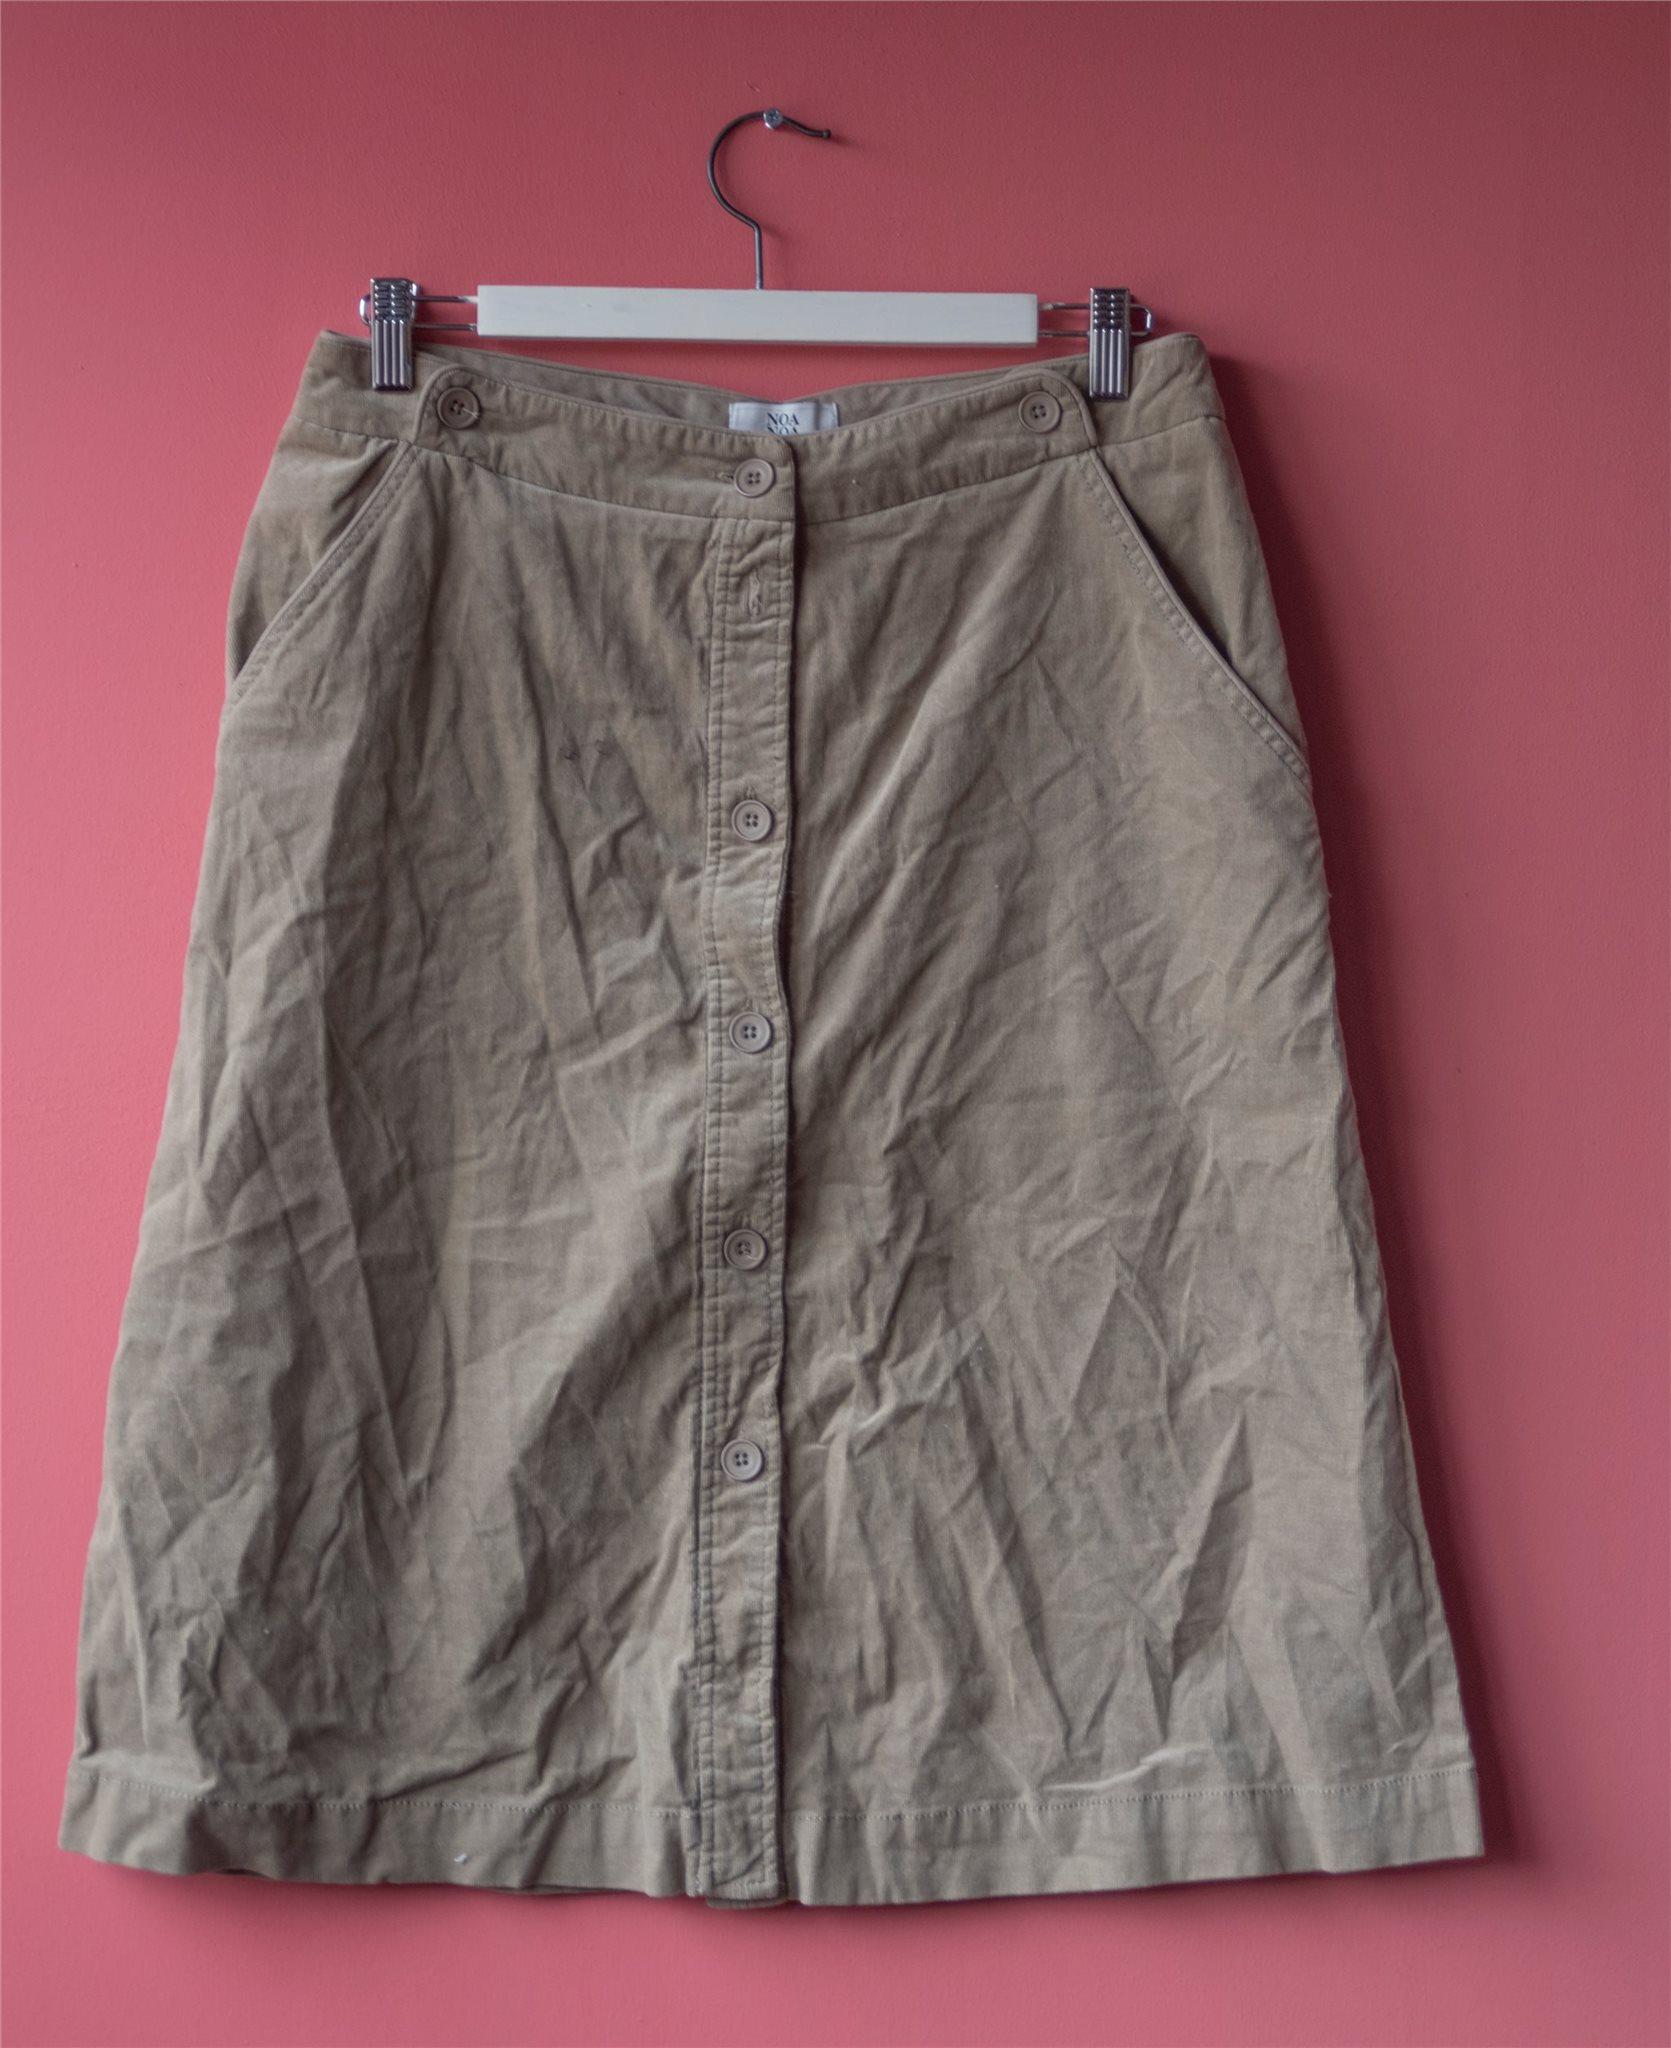 Klassisk kjol från NOA NOA i stl L (335392149) ᐈ Köp på Tradera e0b16f332d162